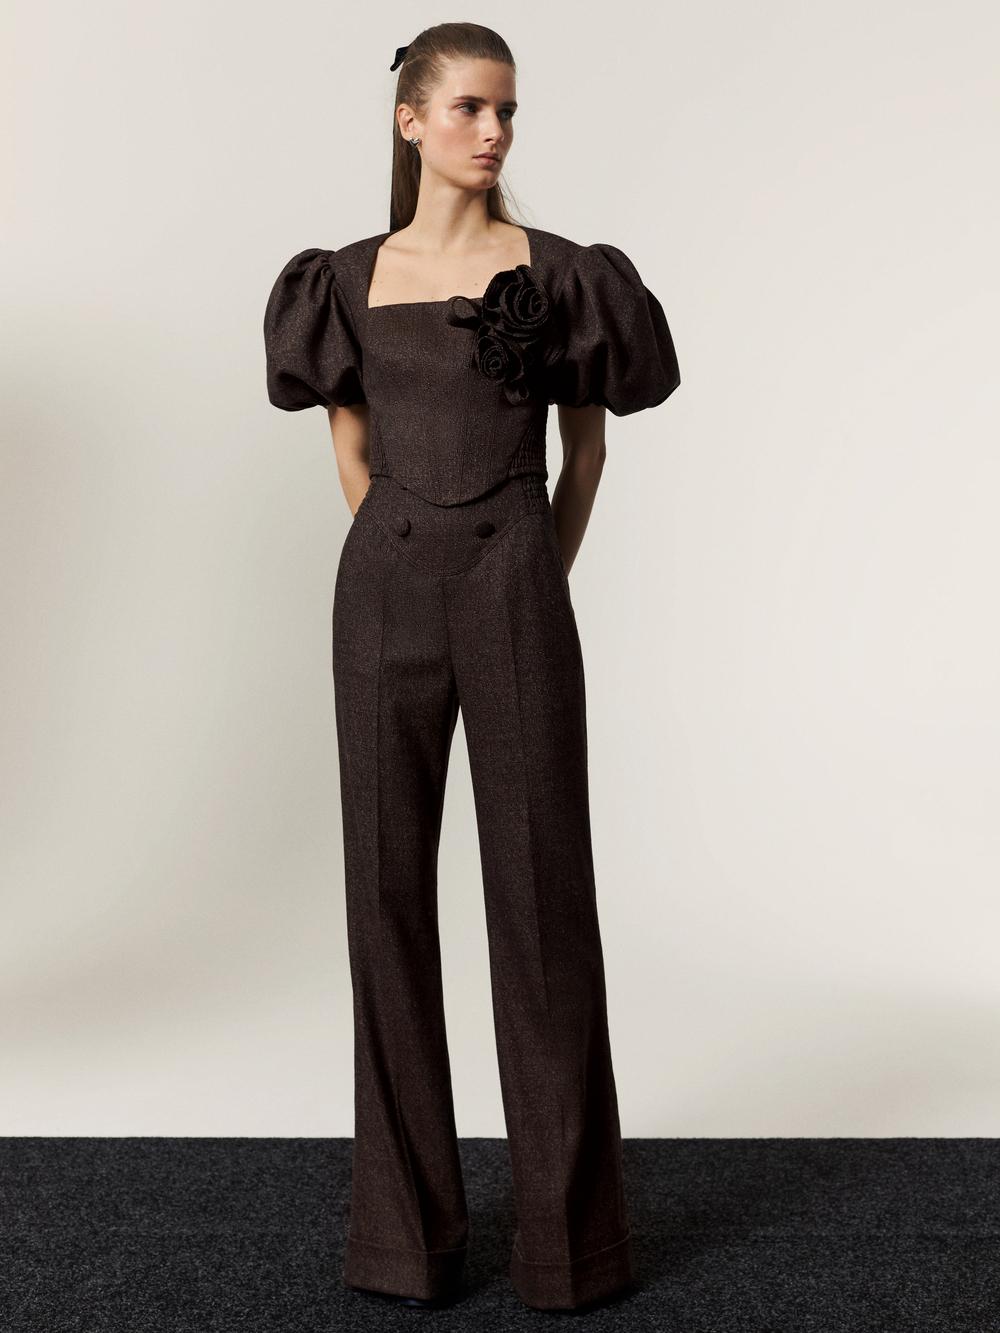 В стиле Жаклин Кеннеди: Украинский бренд Marianna Senchina презентовал коллекцию Fall-Winter 21/22-Фото 7